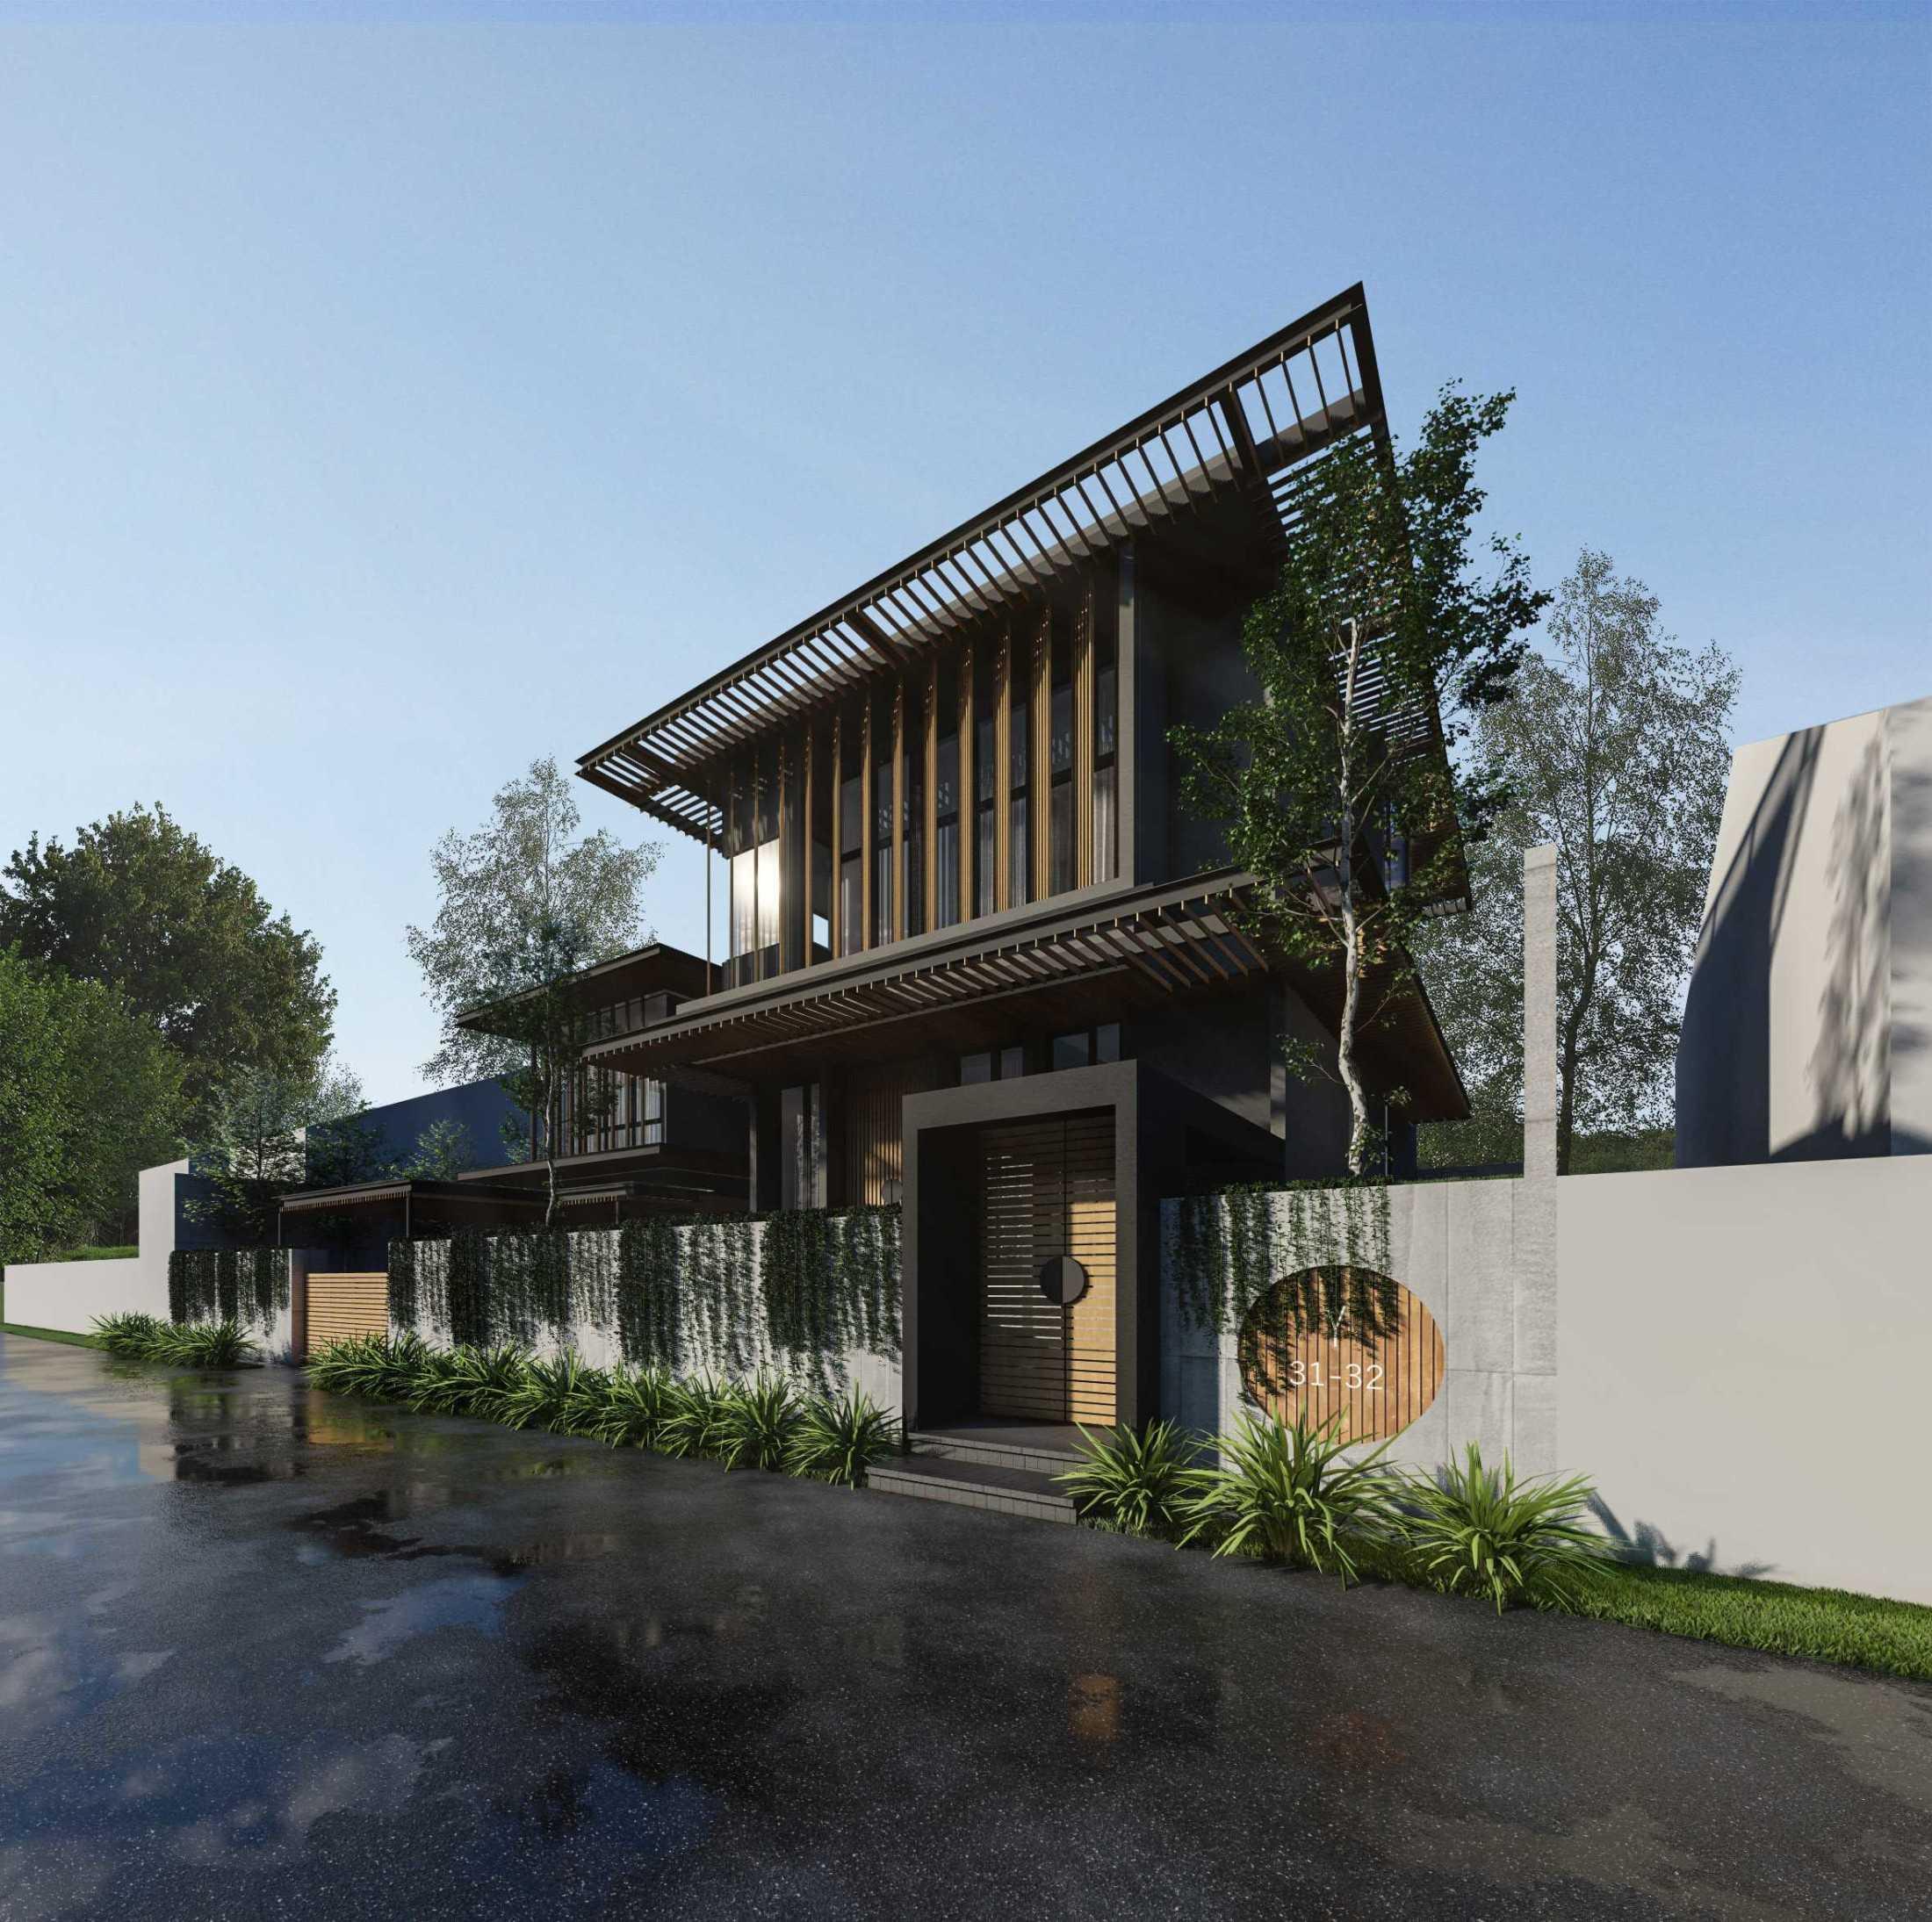 Mahastudio & Partner Y House Palembang, Kota Palembang, Sumatera Selatan, Indonesia Palembang, Kota Palembang, Sumatera Selatan, Indonesia Mahastudio-Partner-Y-House  97230